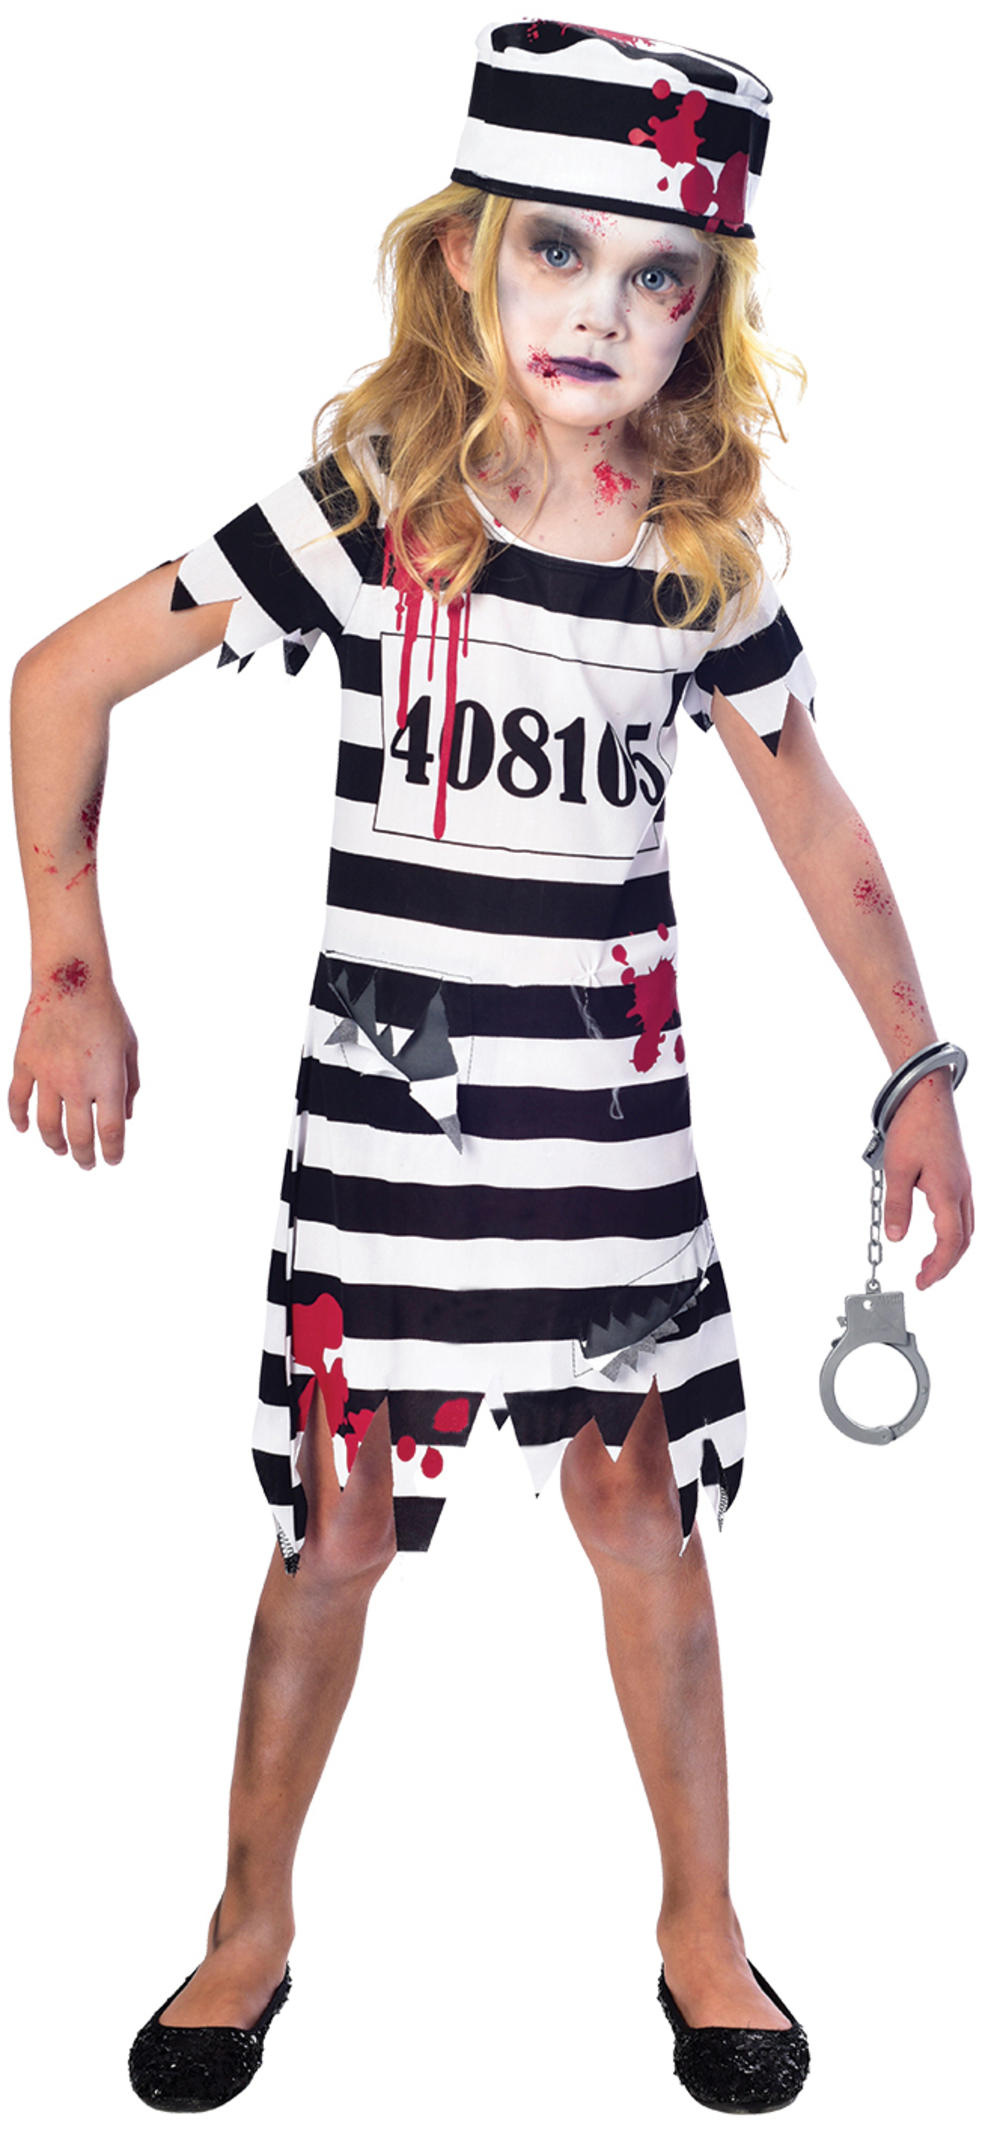 Zombie Convict Ladies Halloween Fancy Dress Prisoner Uniform Womens Costume New